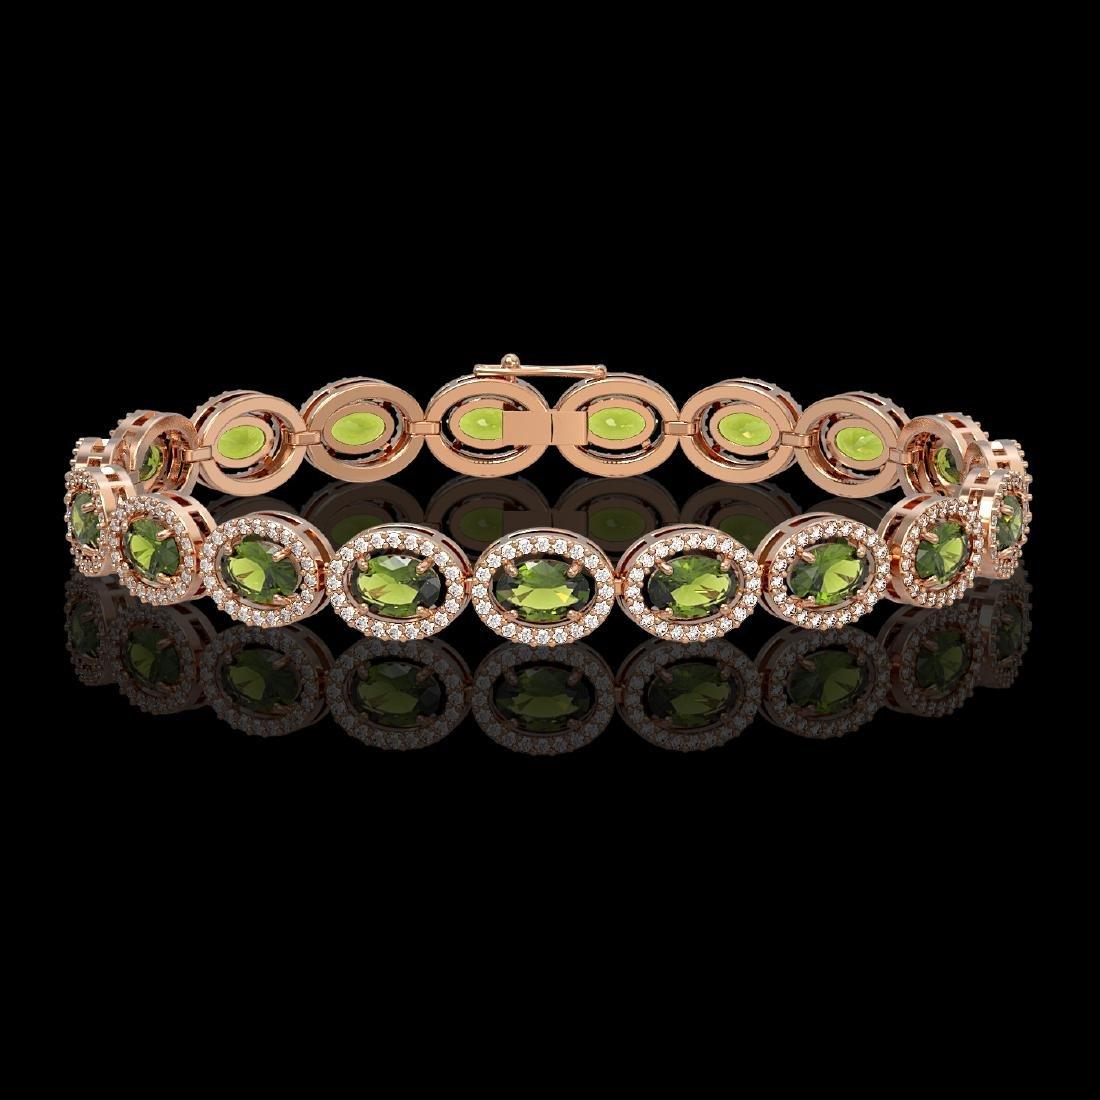 13.87 CTW Tourmaline & Diamond Halo Bracelet 10K Rose